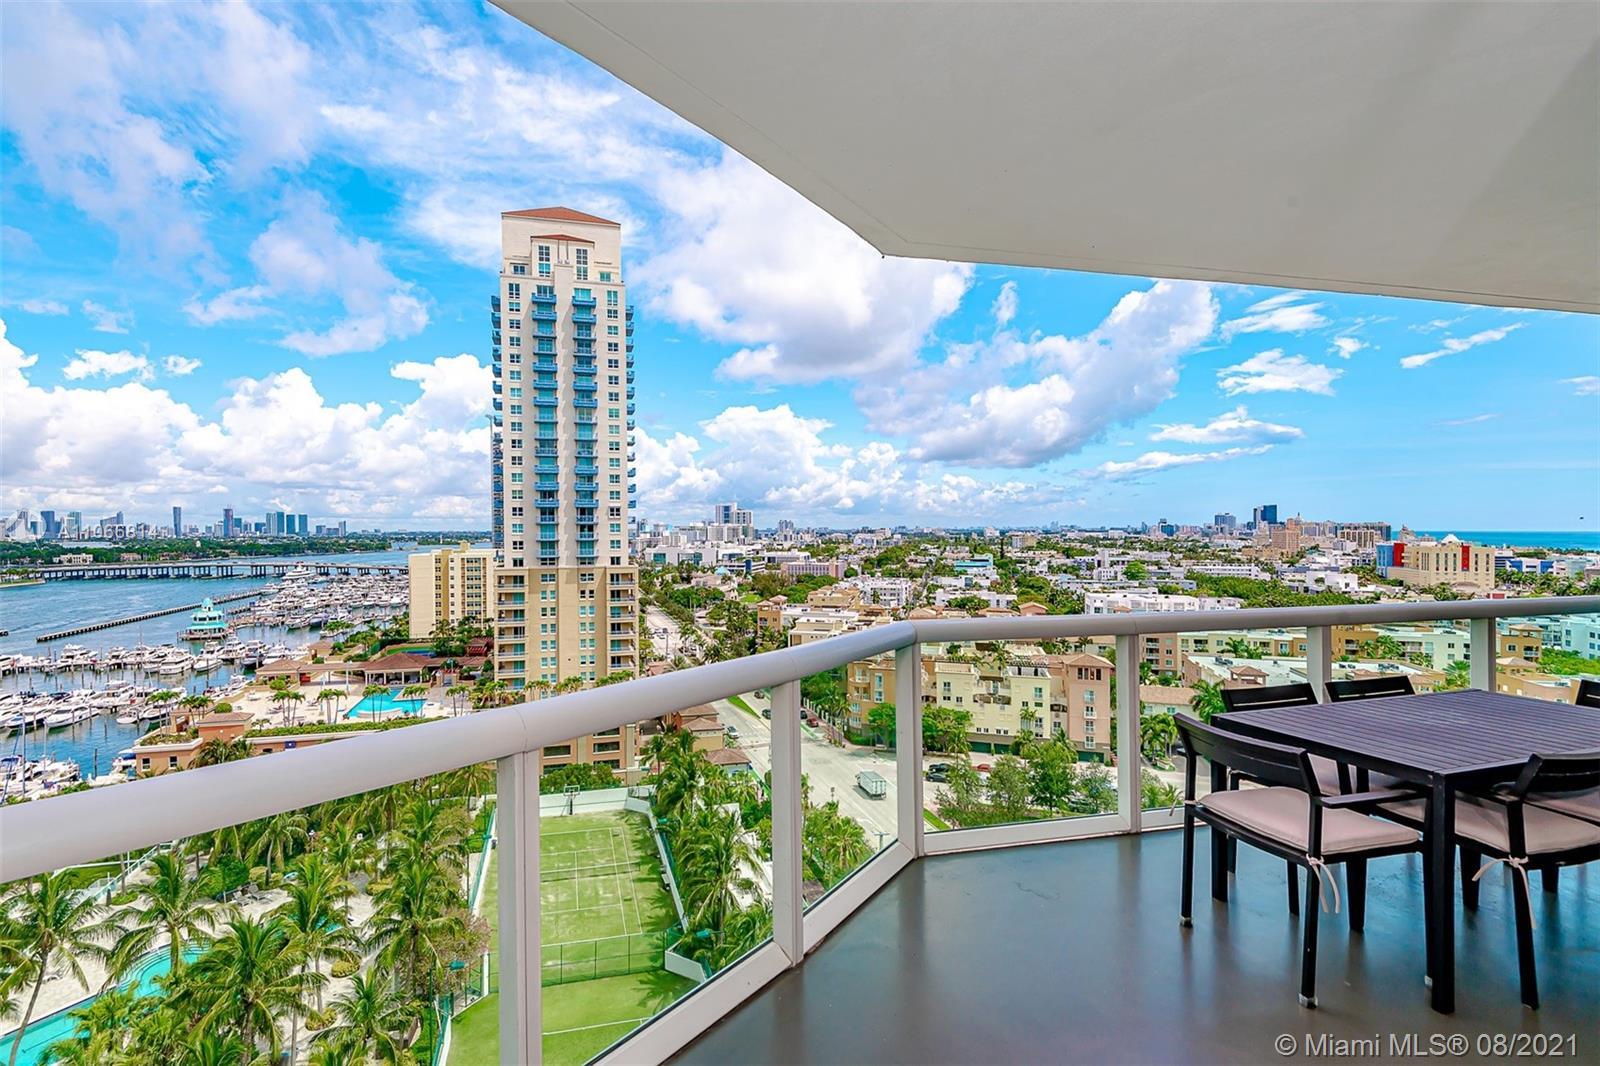 1000 Pointe Dr Unit 1508, Miami Beach, Florida 33139